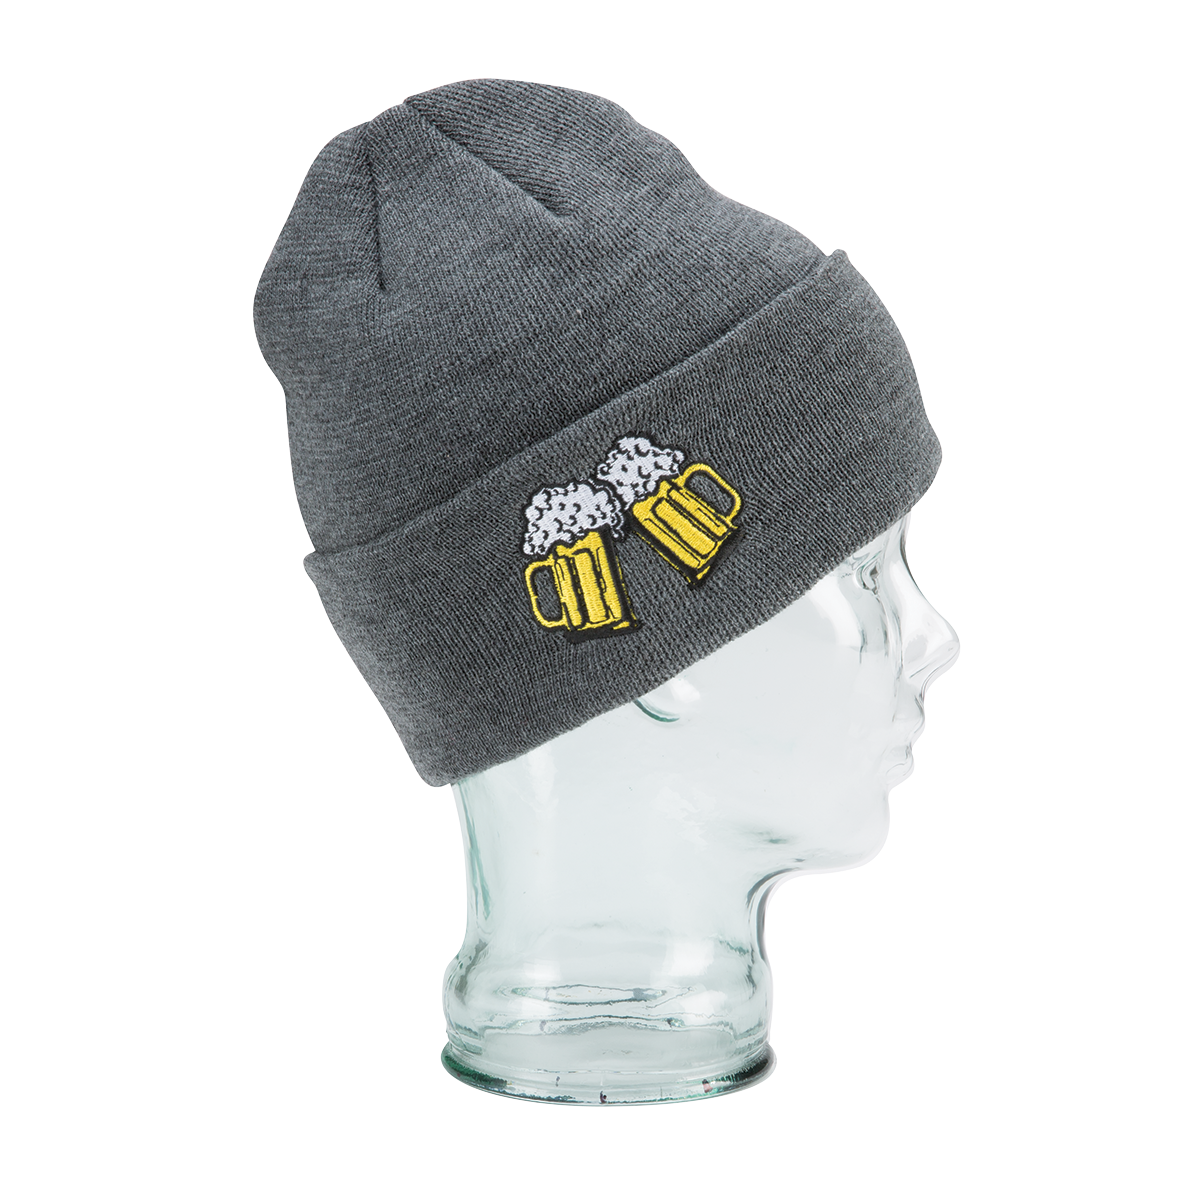 ec493c7d2f3 Coal Headwear ( CoalHeadwear)